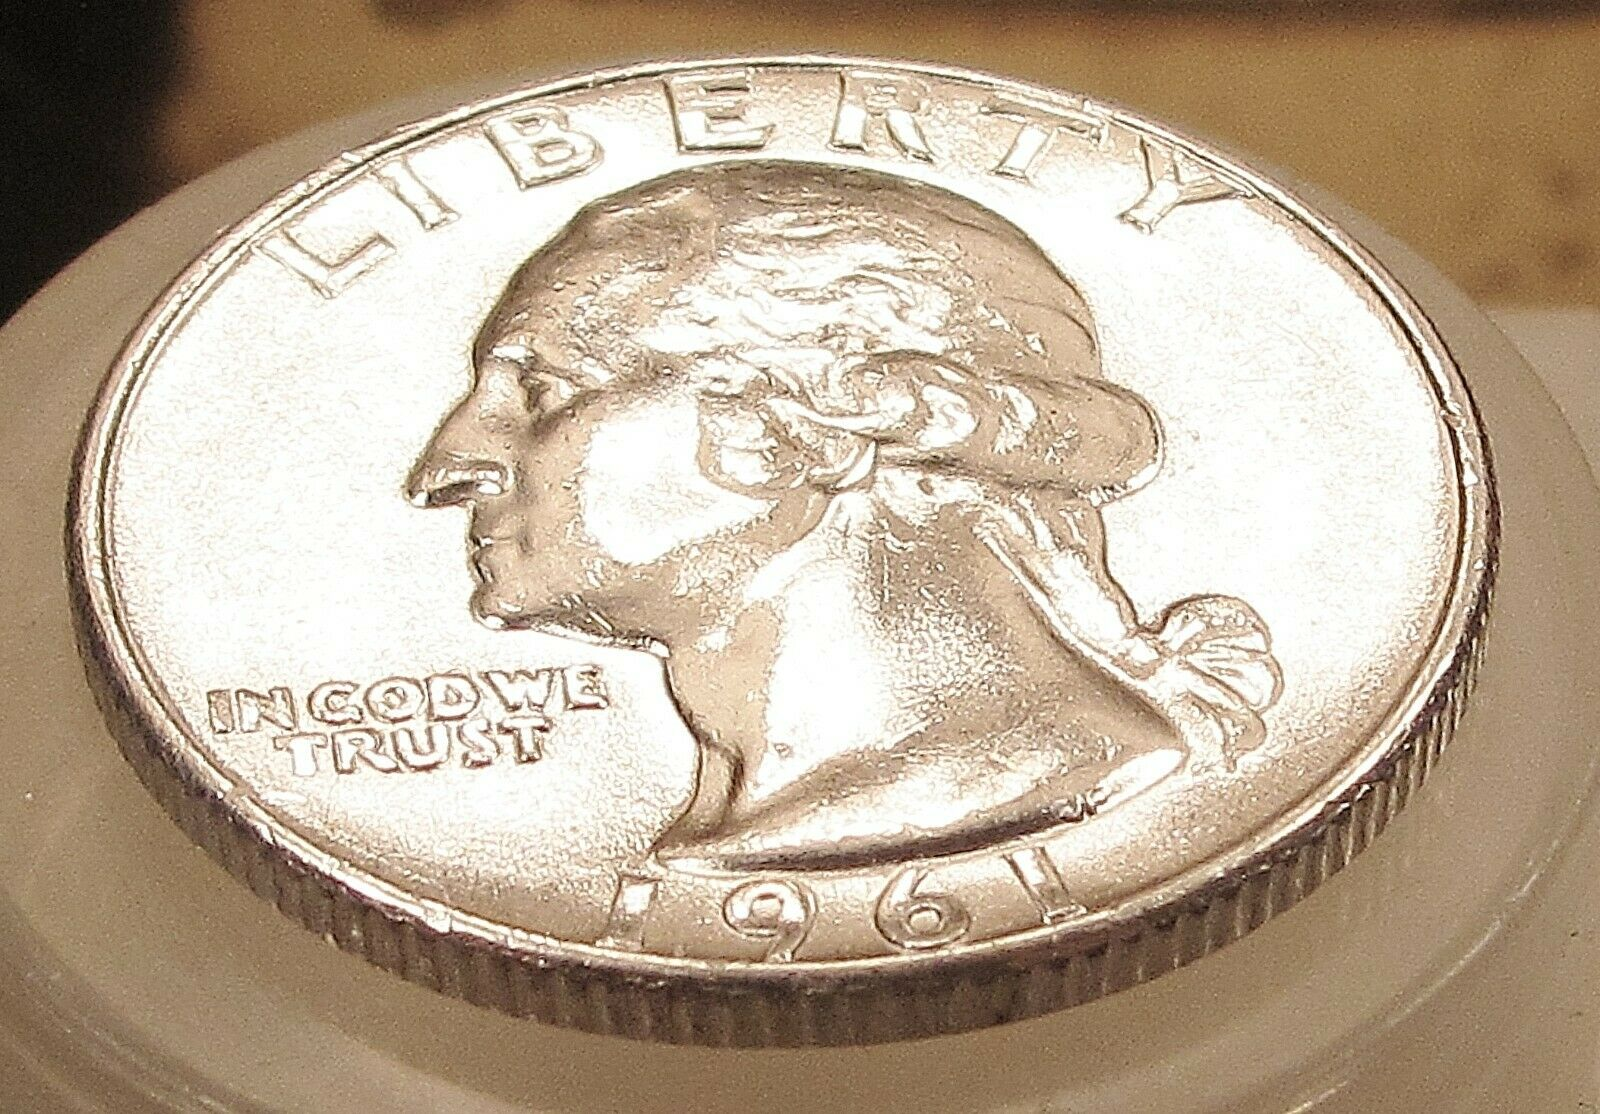 1961 Brilliant UNC Quarter 90 SILVER Decent Coin Great Price 504 47 - $5.51